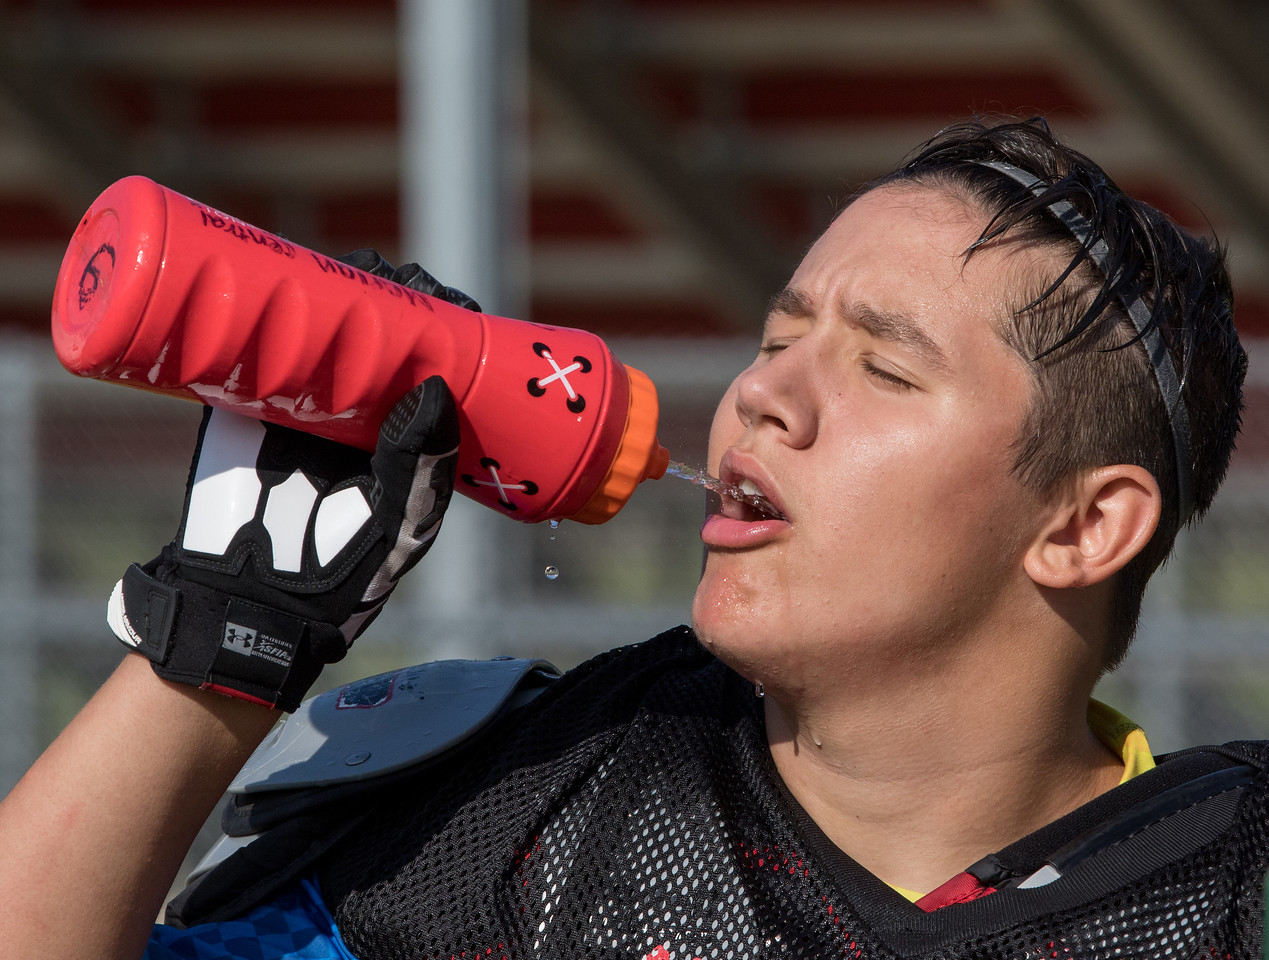 Marion Central Catholic High School's linebacker Patrick Brunken hits the water during practice Wednesday, August 9, 2017 at Marion Central High School in Woodstock. Ken Koontz – For Shaw Media